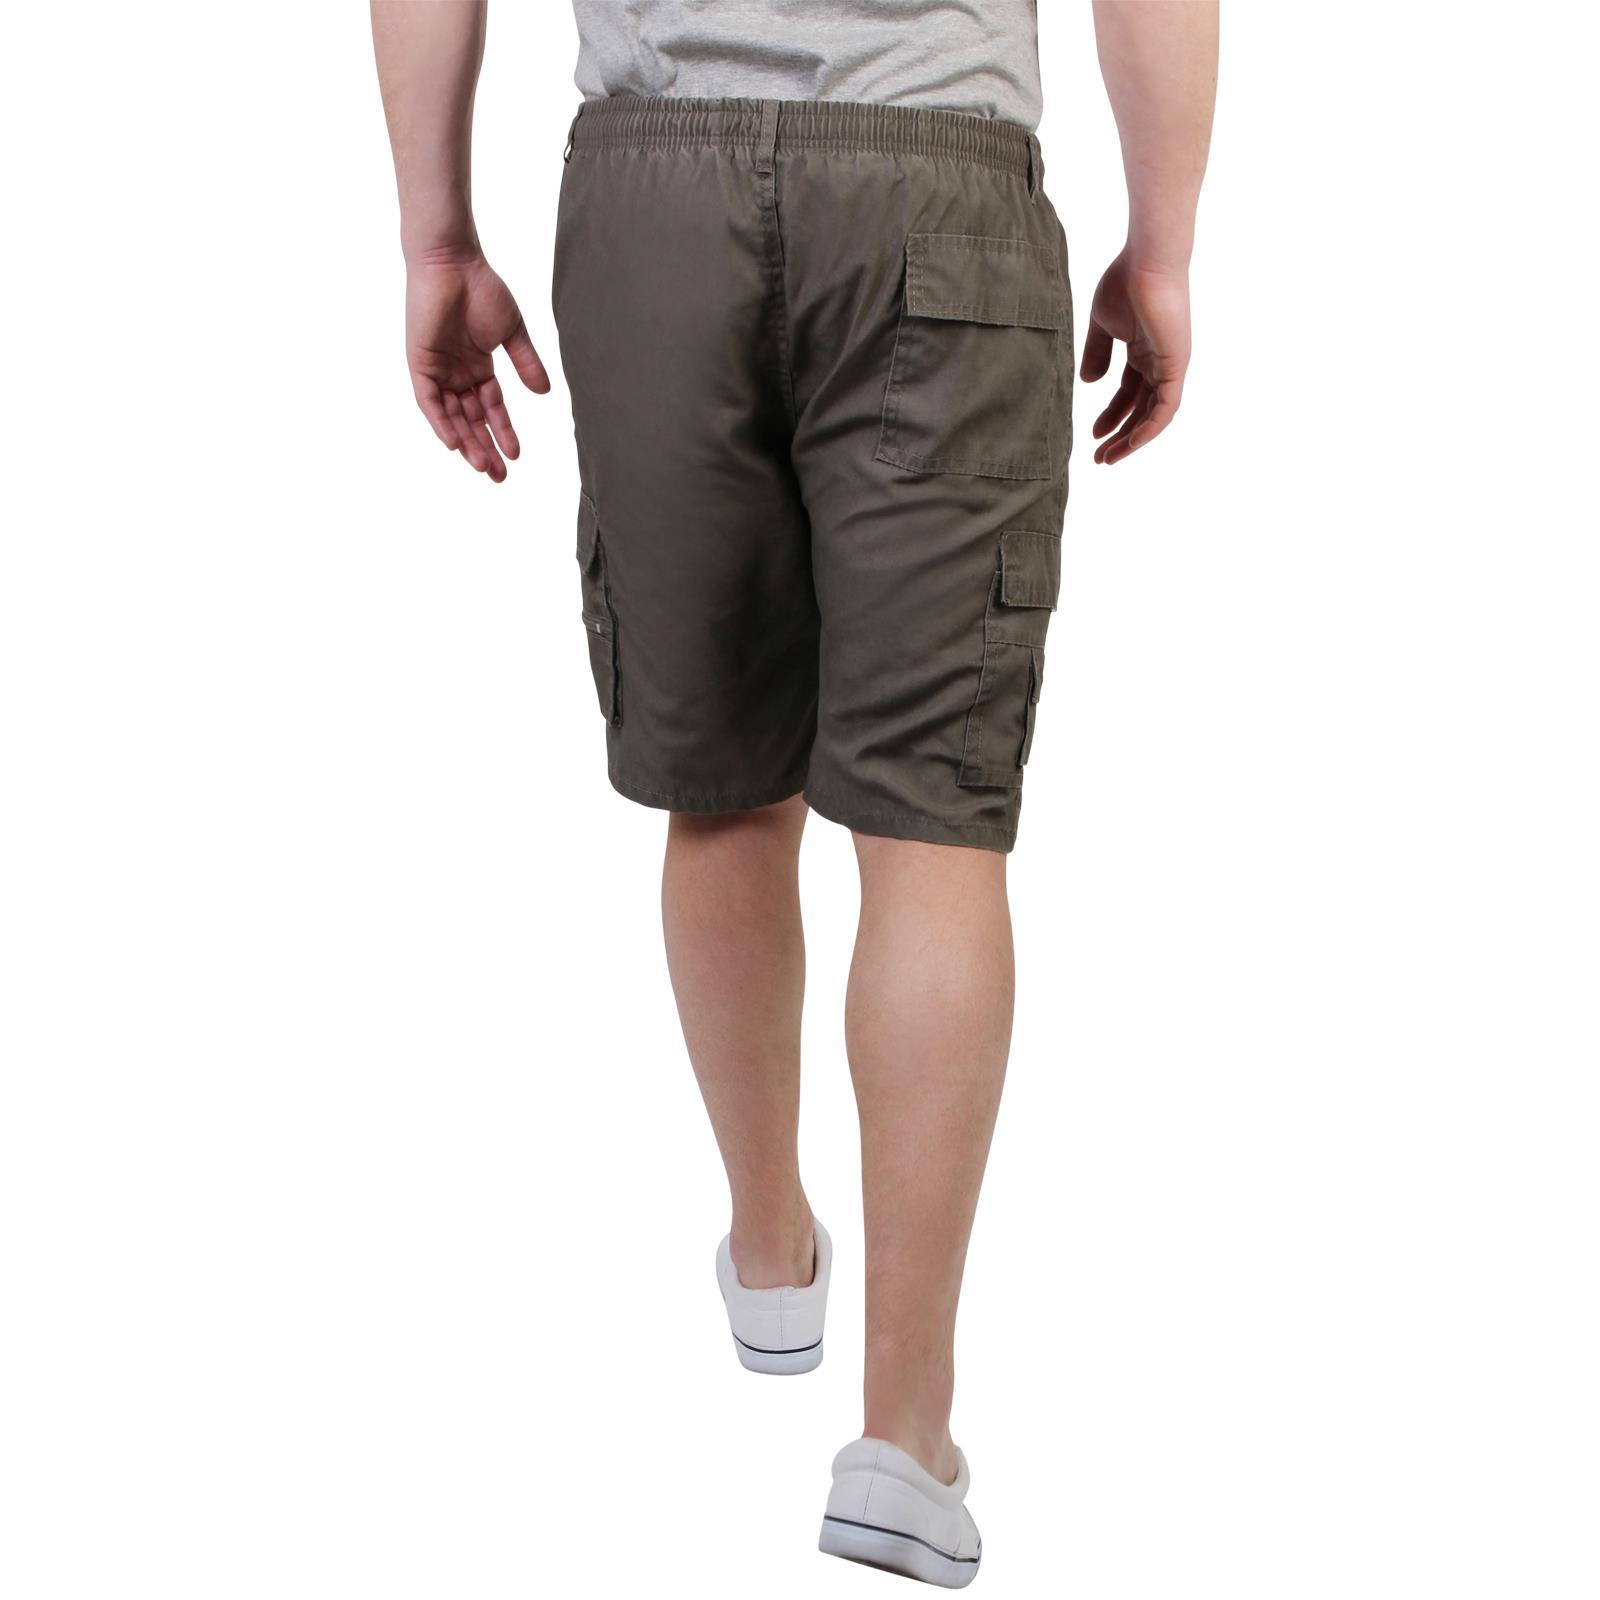 Mens-Cotton-Cargo-Shorts-Plain-Basic-Casual-Work-Chinos-Combat-Pants-Regular thumbnail 18